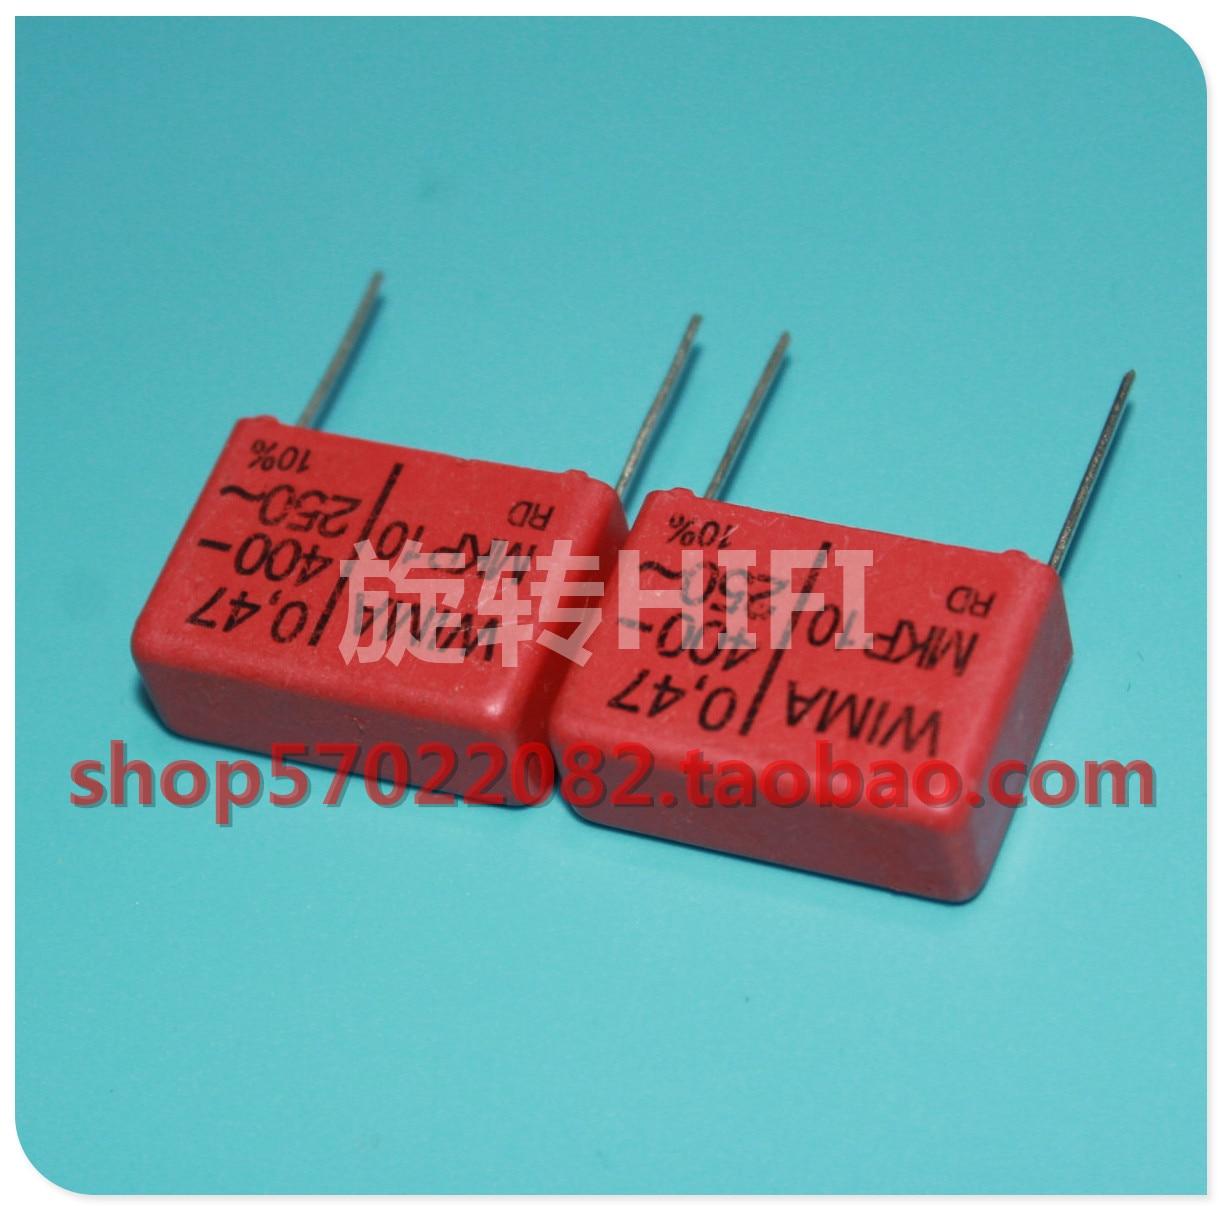 0.47uF 470nF 50V céramique multicouche condensateur céramique multicouche condensateurs qté 10 nouveau